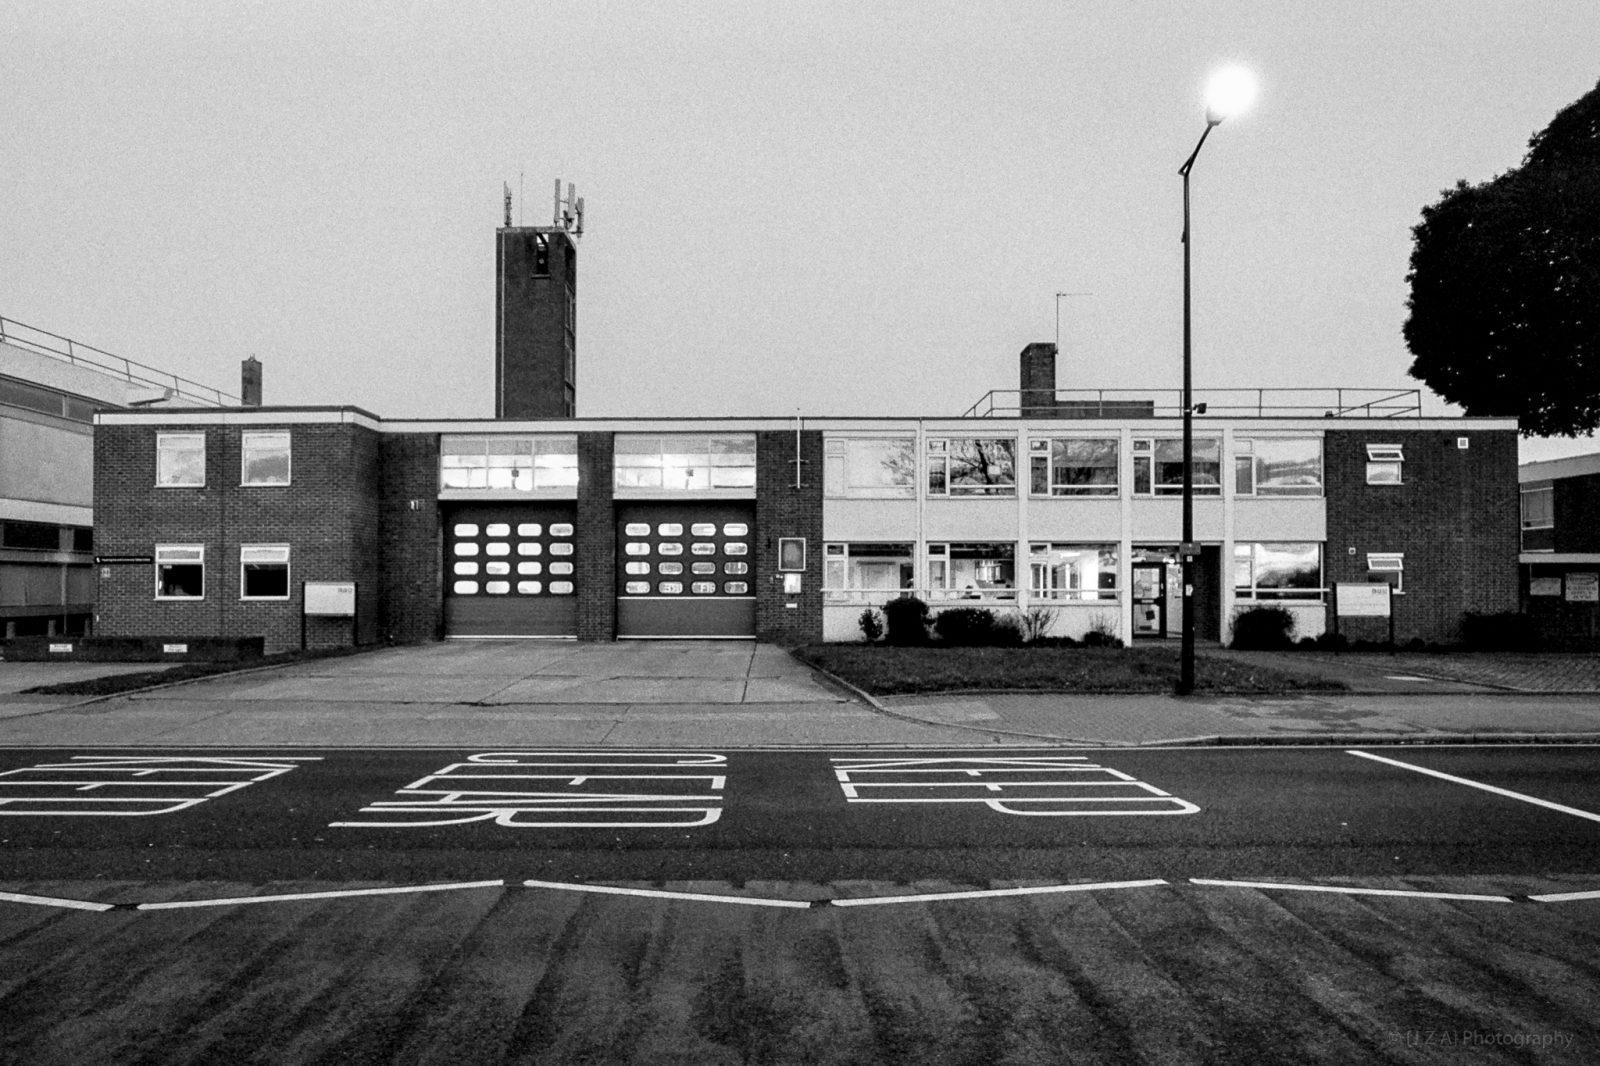 Hornchurch Fire Station